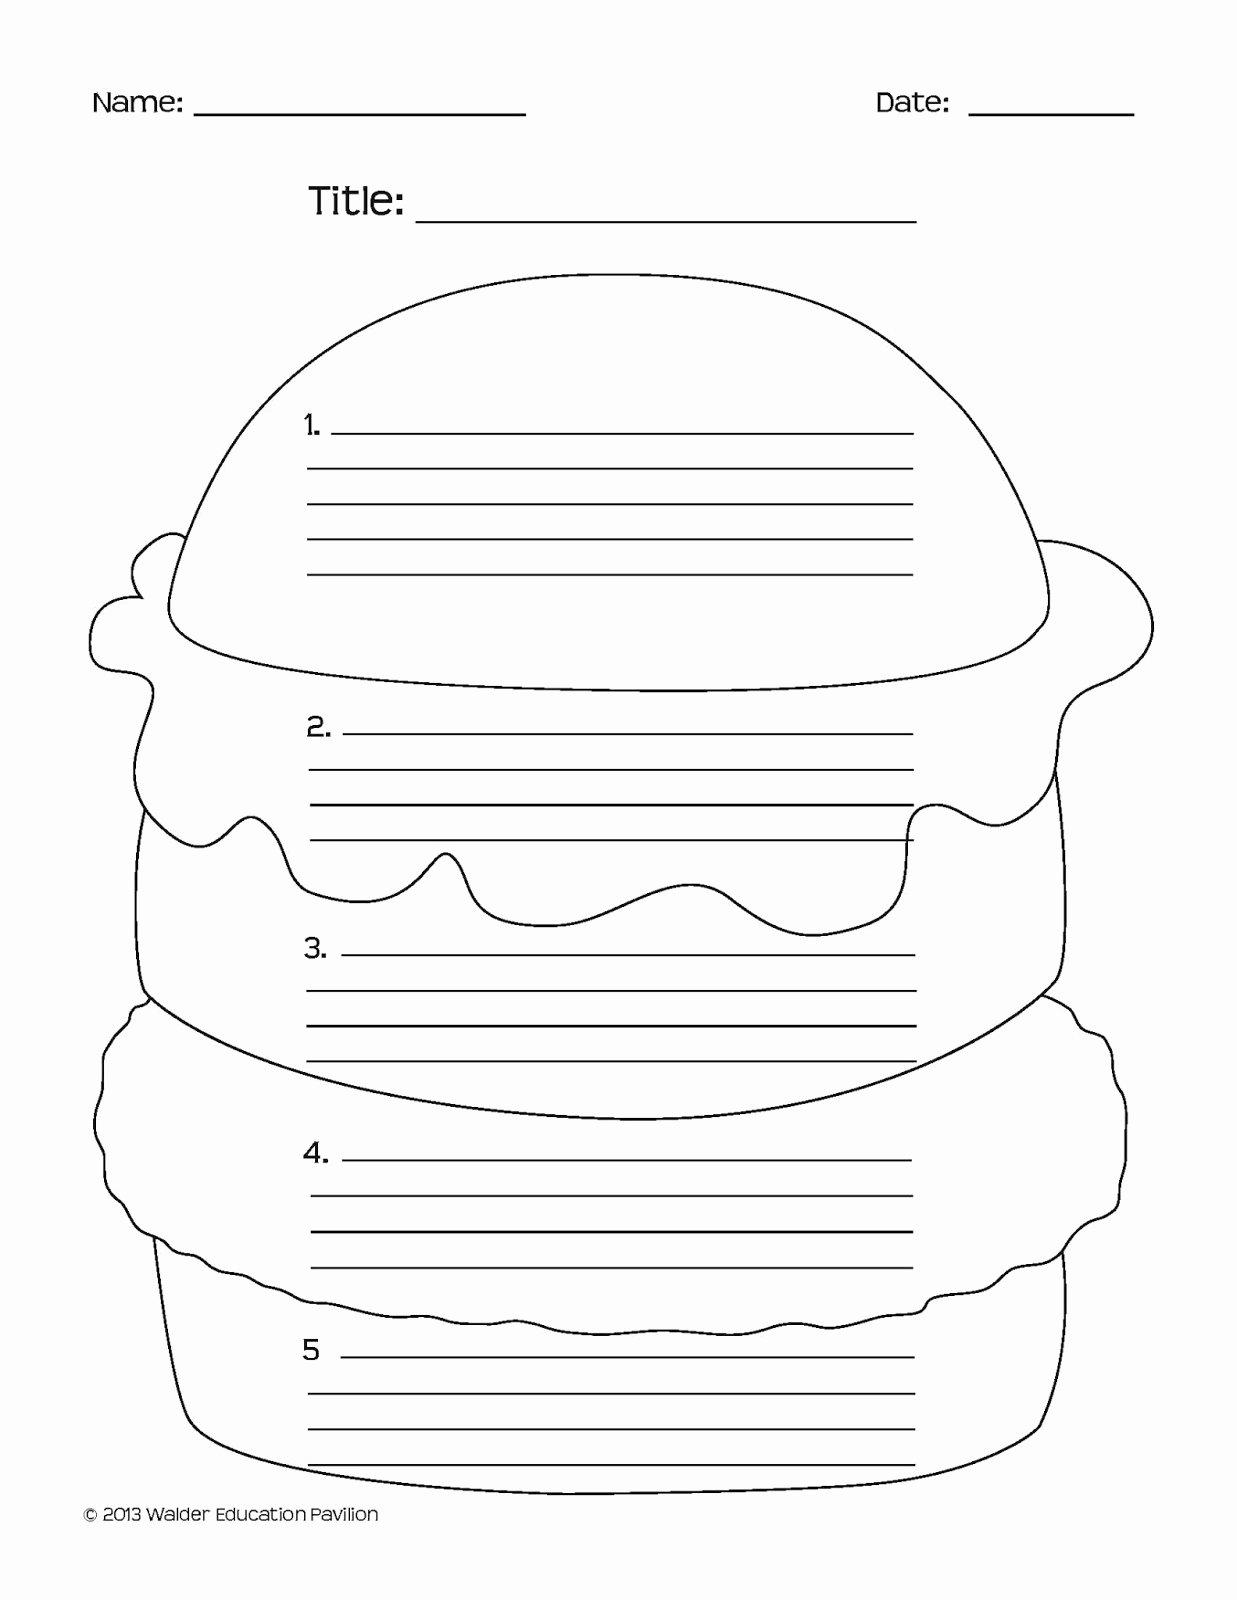 Teddy Roosevelt Square Deal Worksheet Luxury Essay Writing Hamburger Graphic organizer Graphic